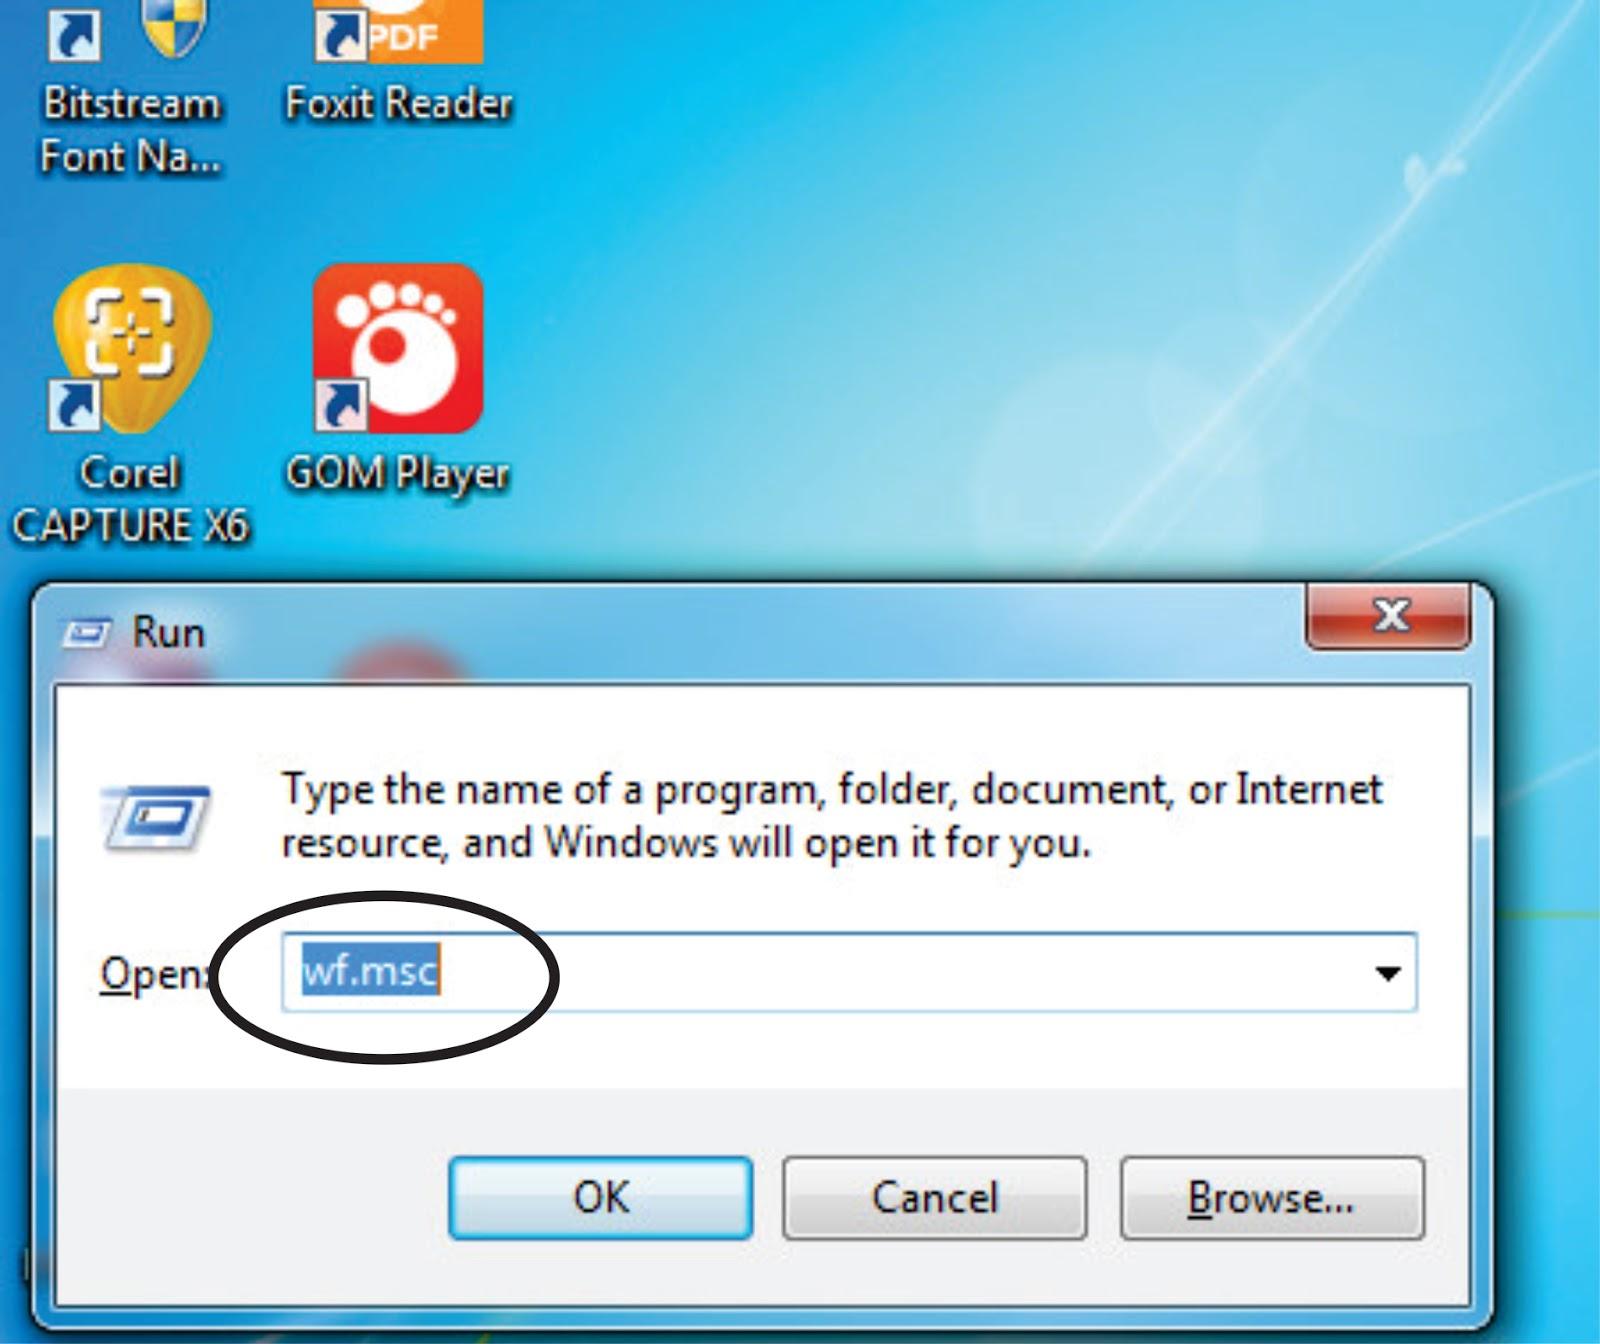 Cara Mudah Blokir Aplikasi dengan Windows Firewall - Pejuangmuda45